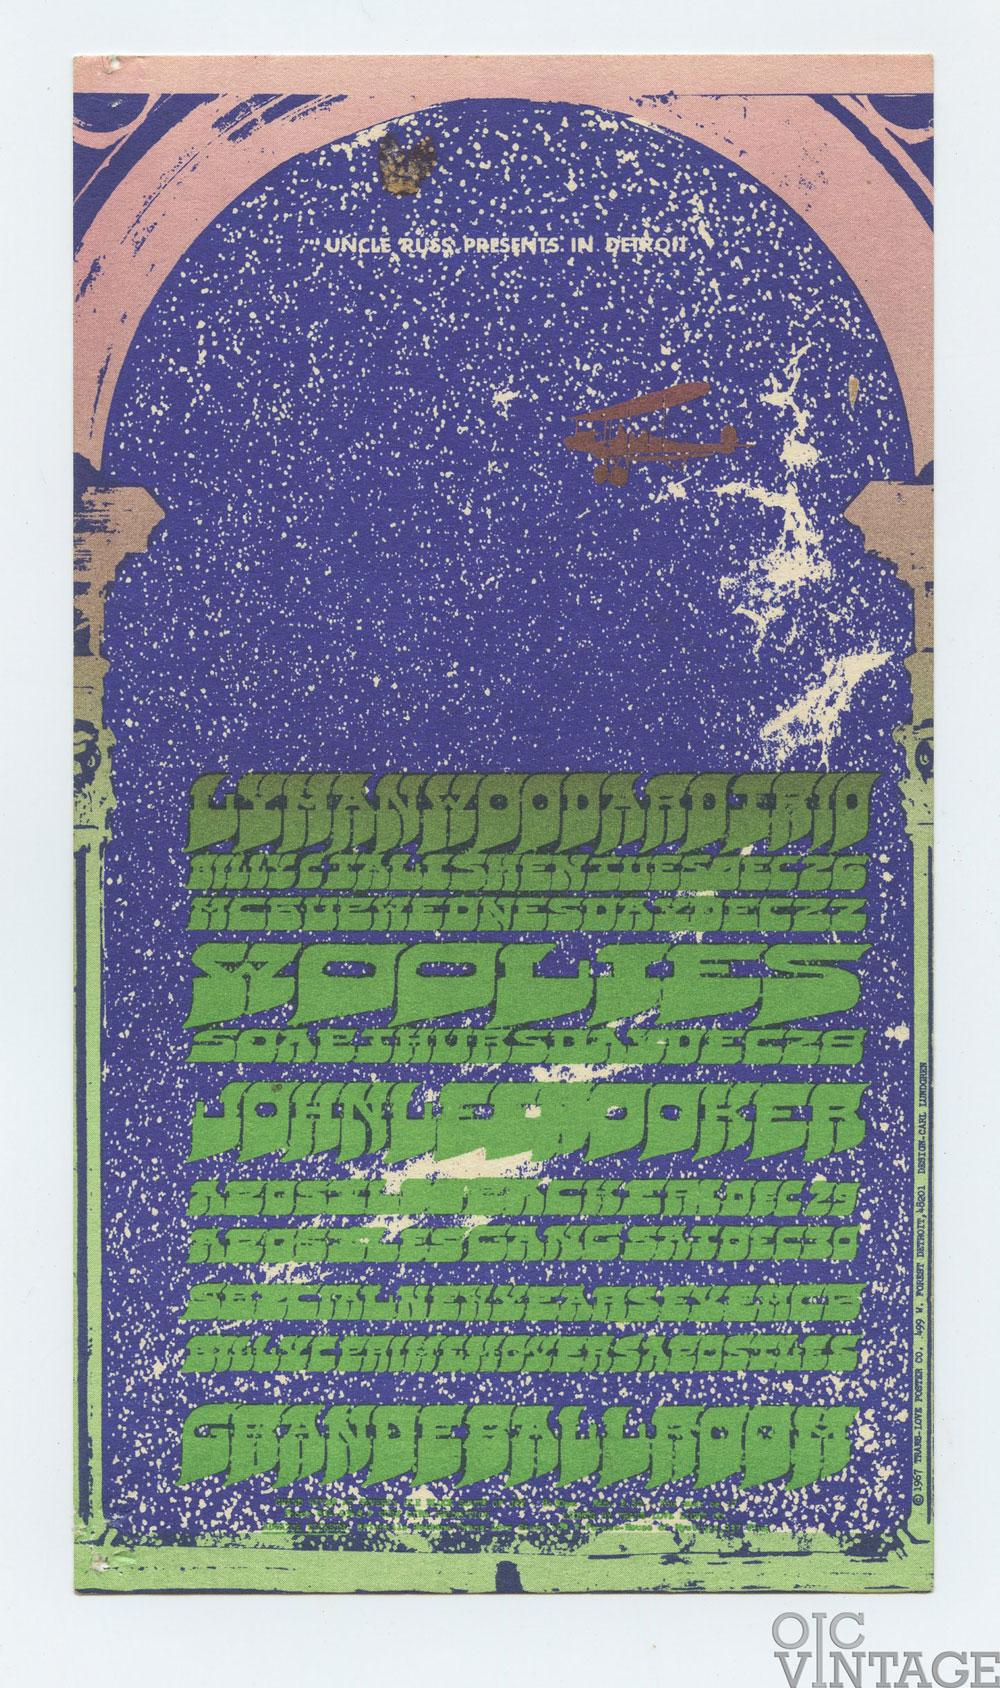 Grande Ballroom Postcard 1967 Dec 26 MC5 John Lee Hooker Condition Very Fine